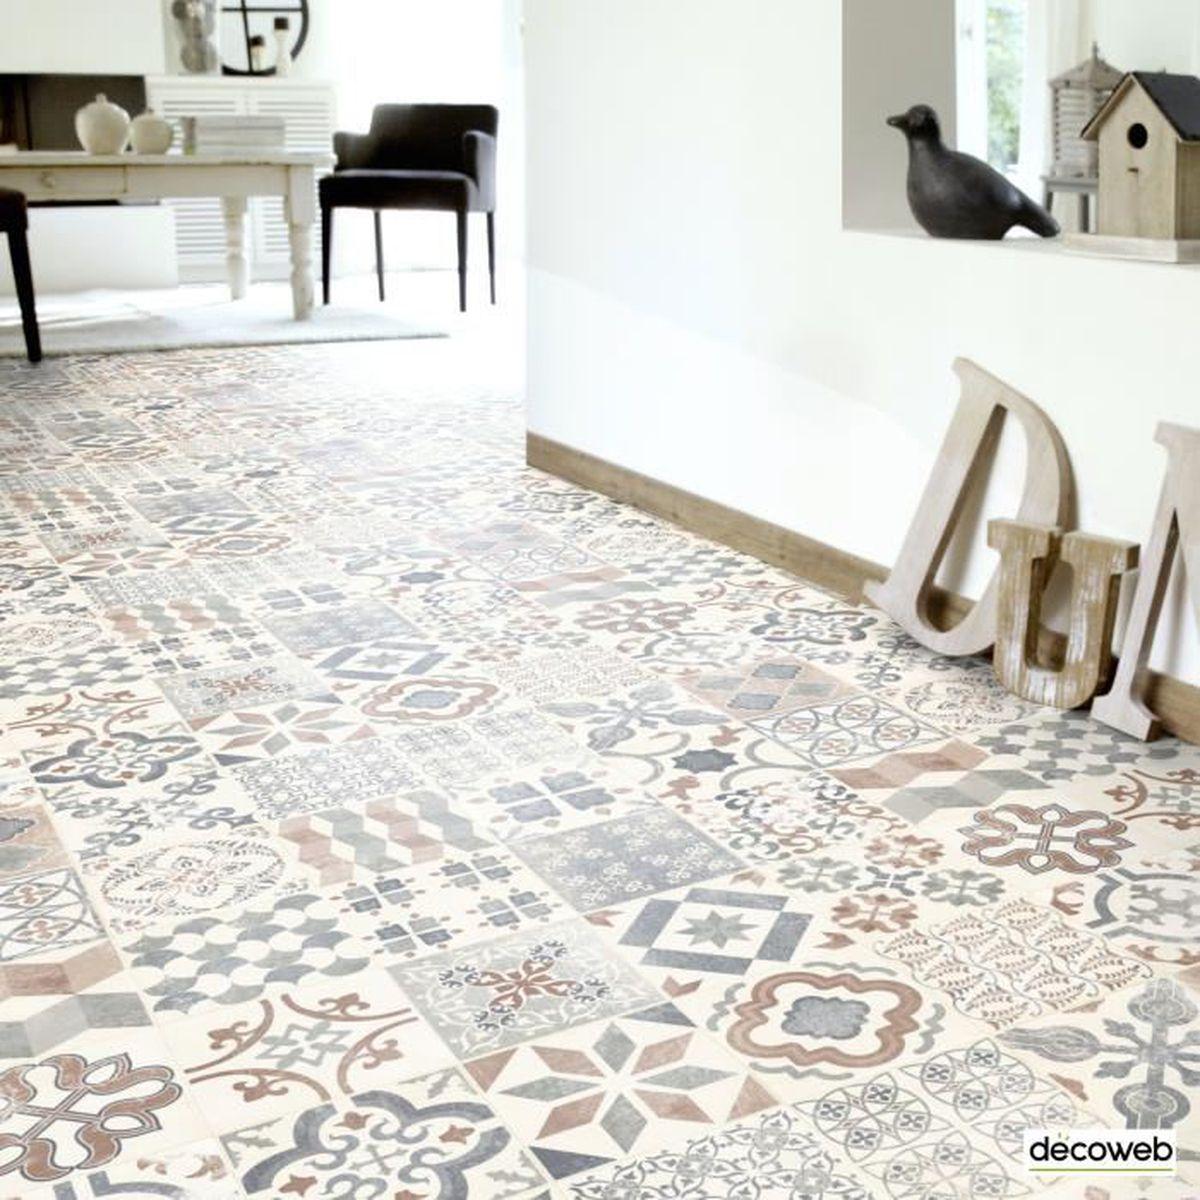 9 x 9m - Sol PVC Lino - Imitation Carreaux de ciment naturel